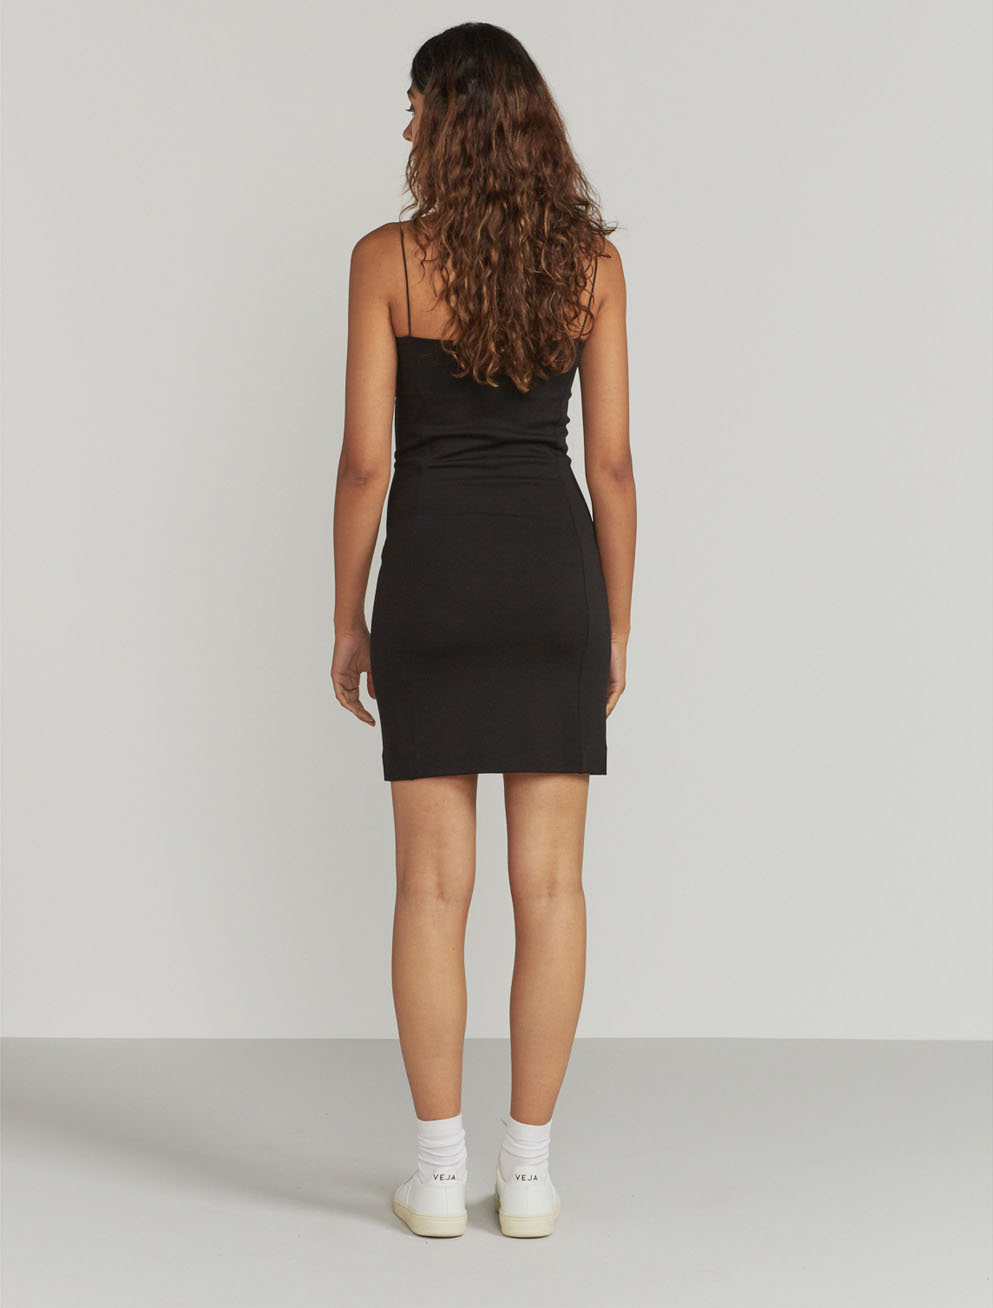 Bodycon panelled dress